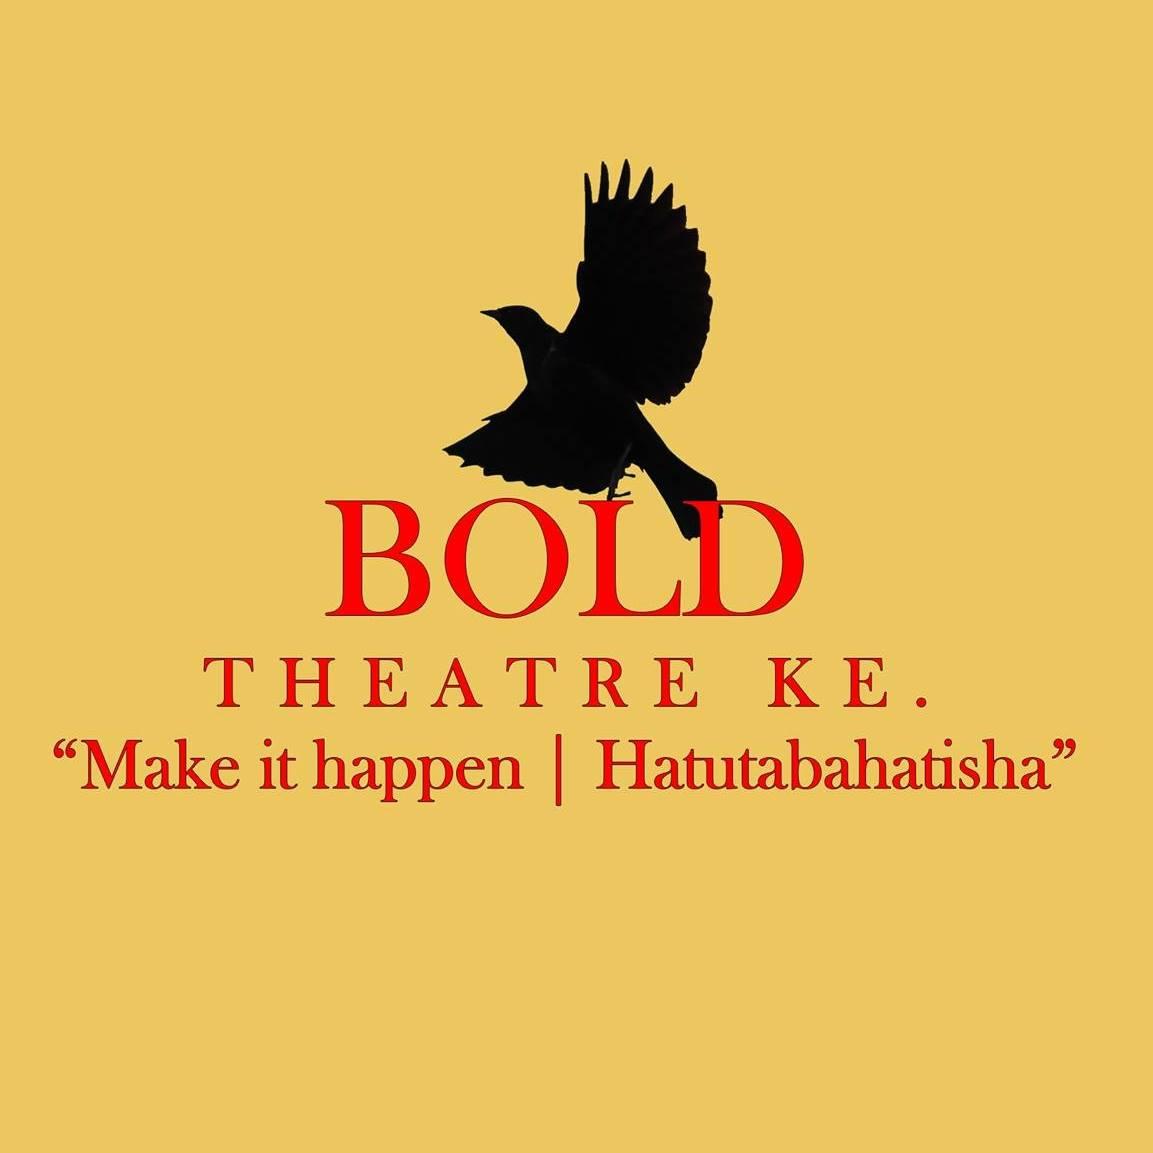 Bold Theatre KE logo in yellow